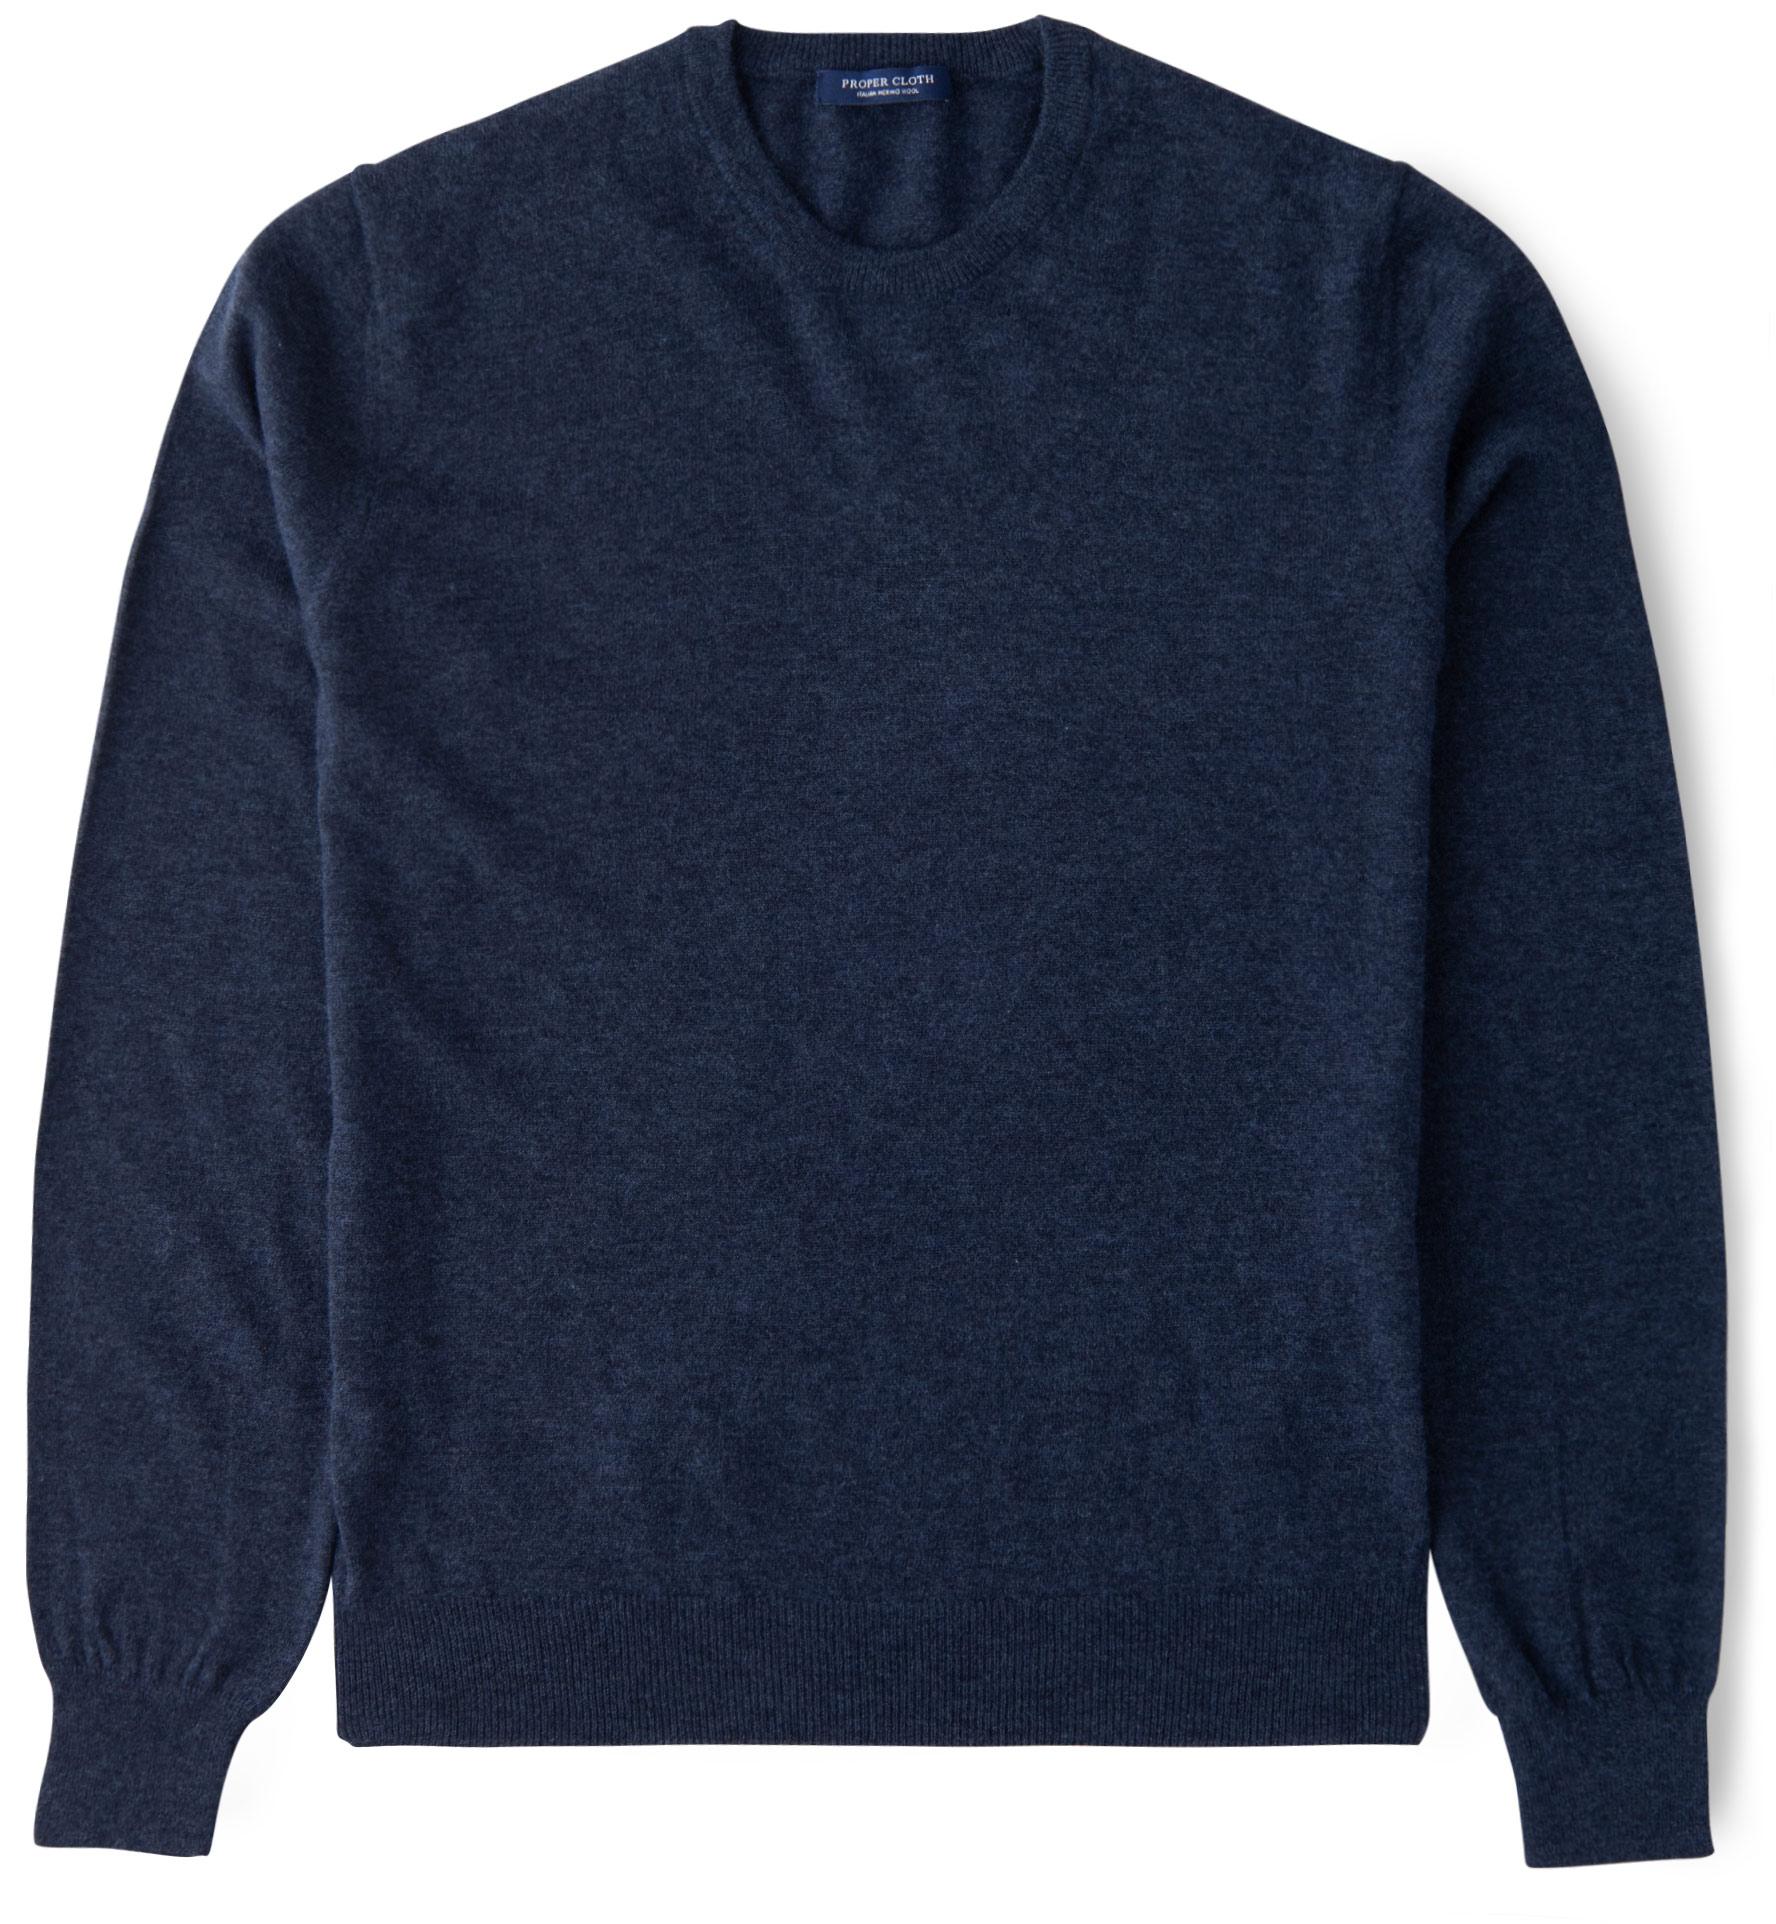 Zoom Image of Slate Blue Merino Crewneck Sweater